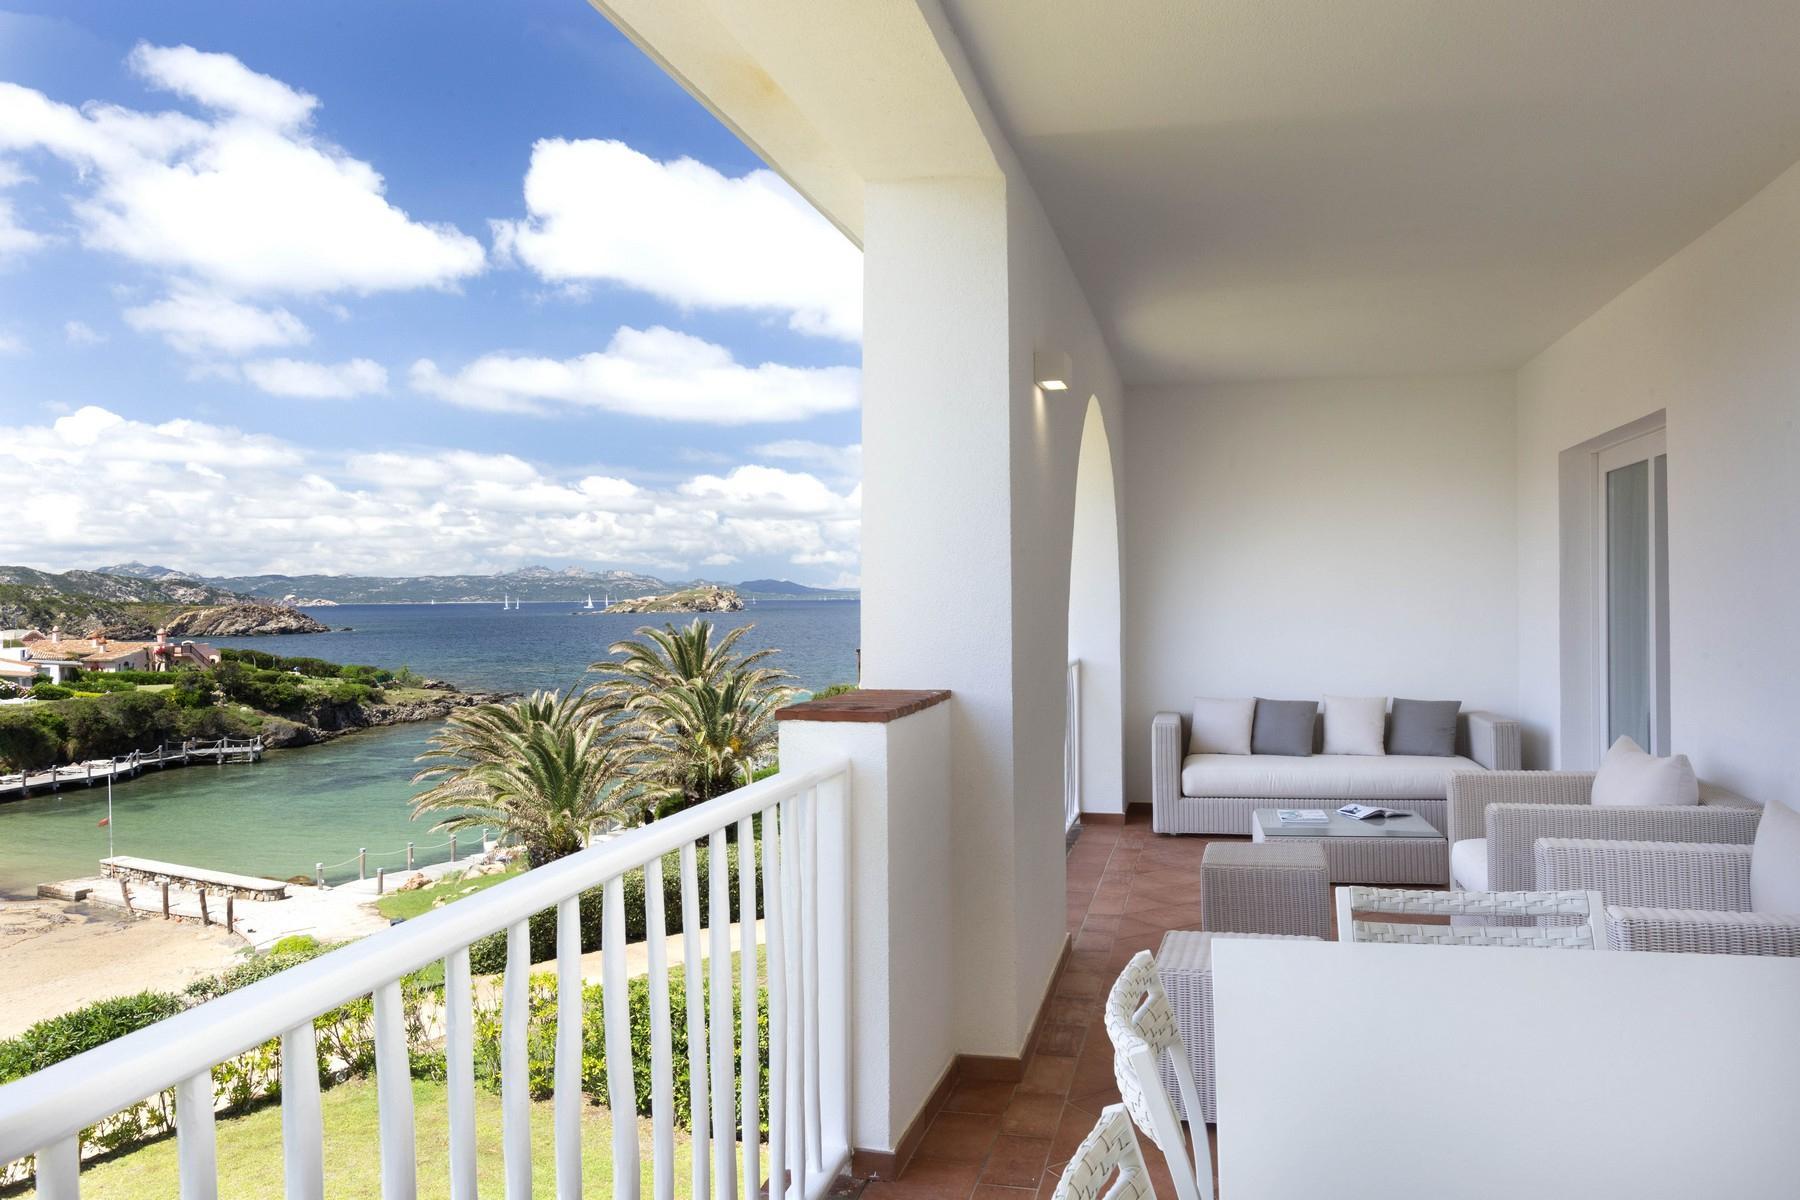 Porto Cervo Cala del Faro Wunderschöne Wohnung - 3